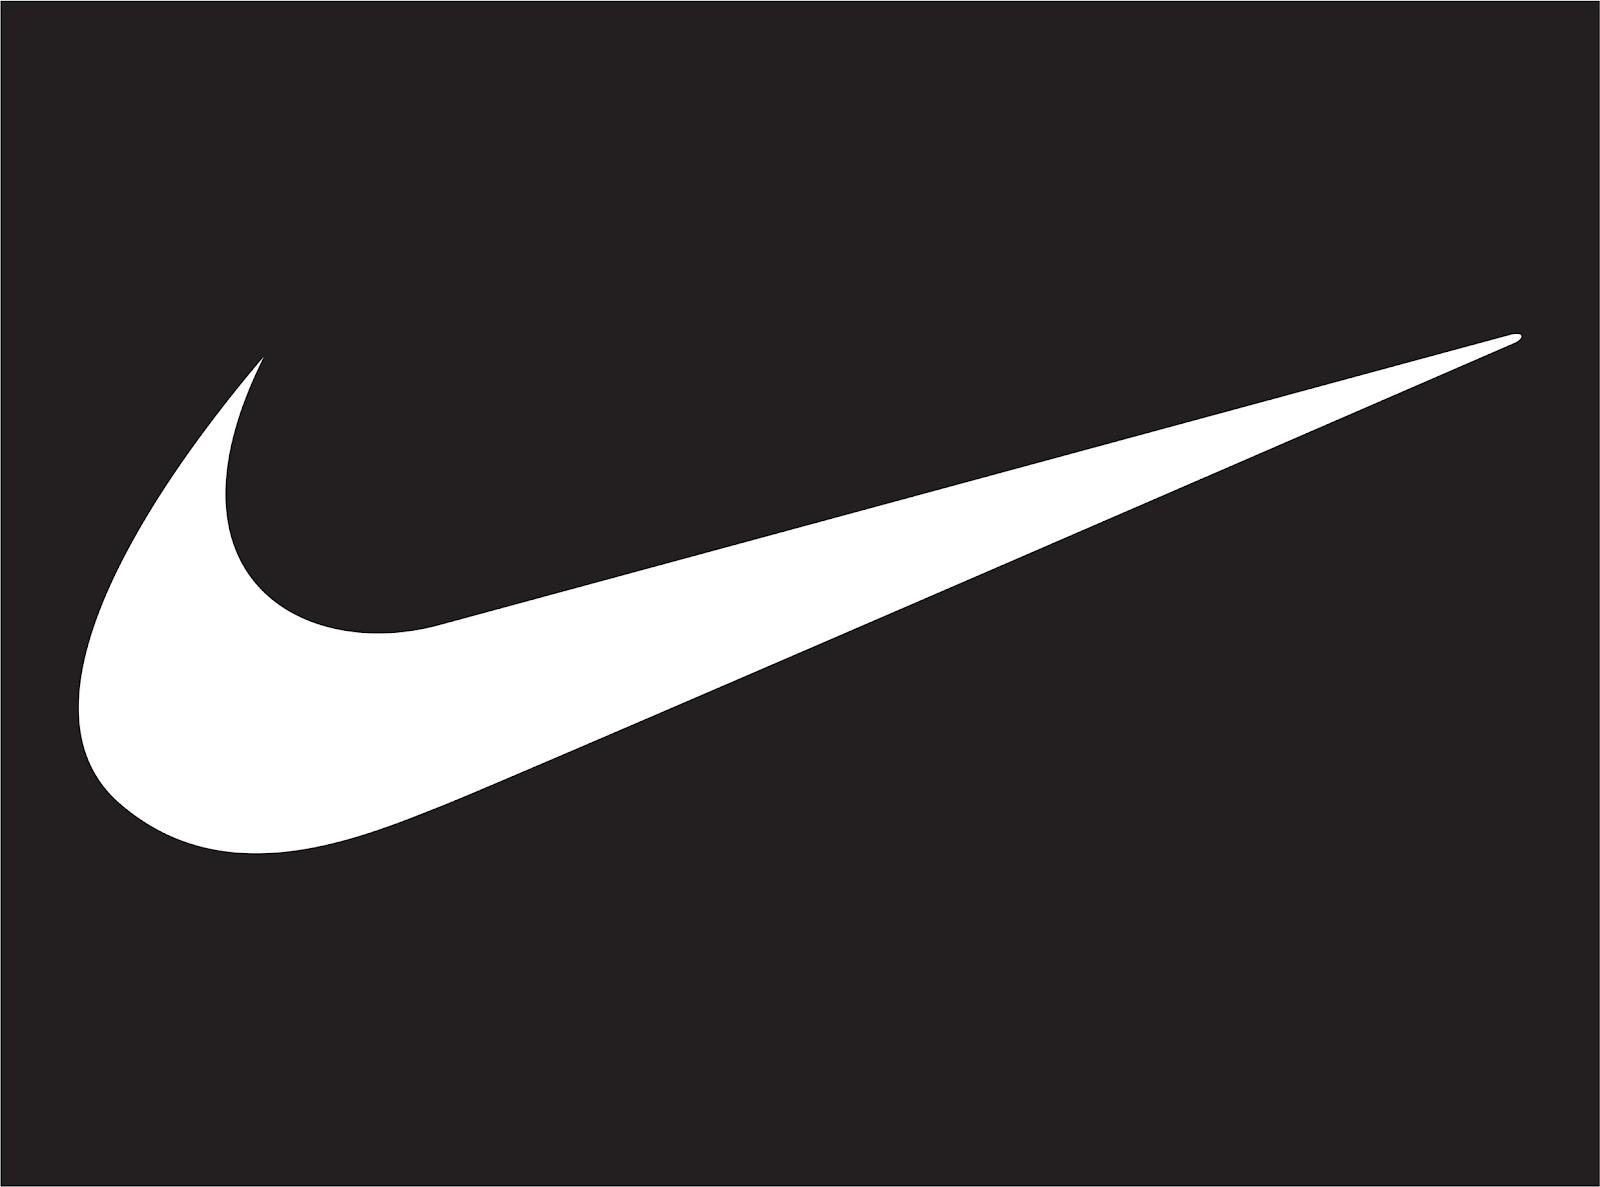 Download image Nike G Unit Adidas Logos De Y Wallpaper Taringa PC 1600x1187